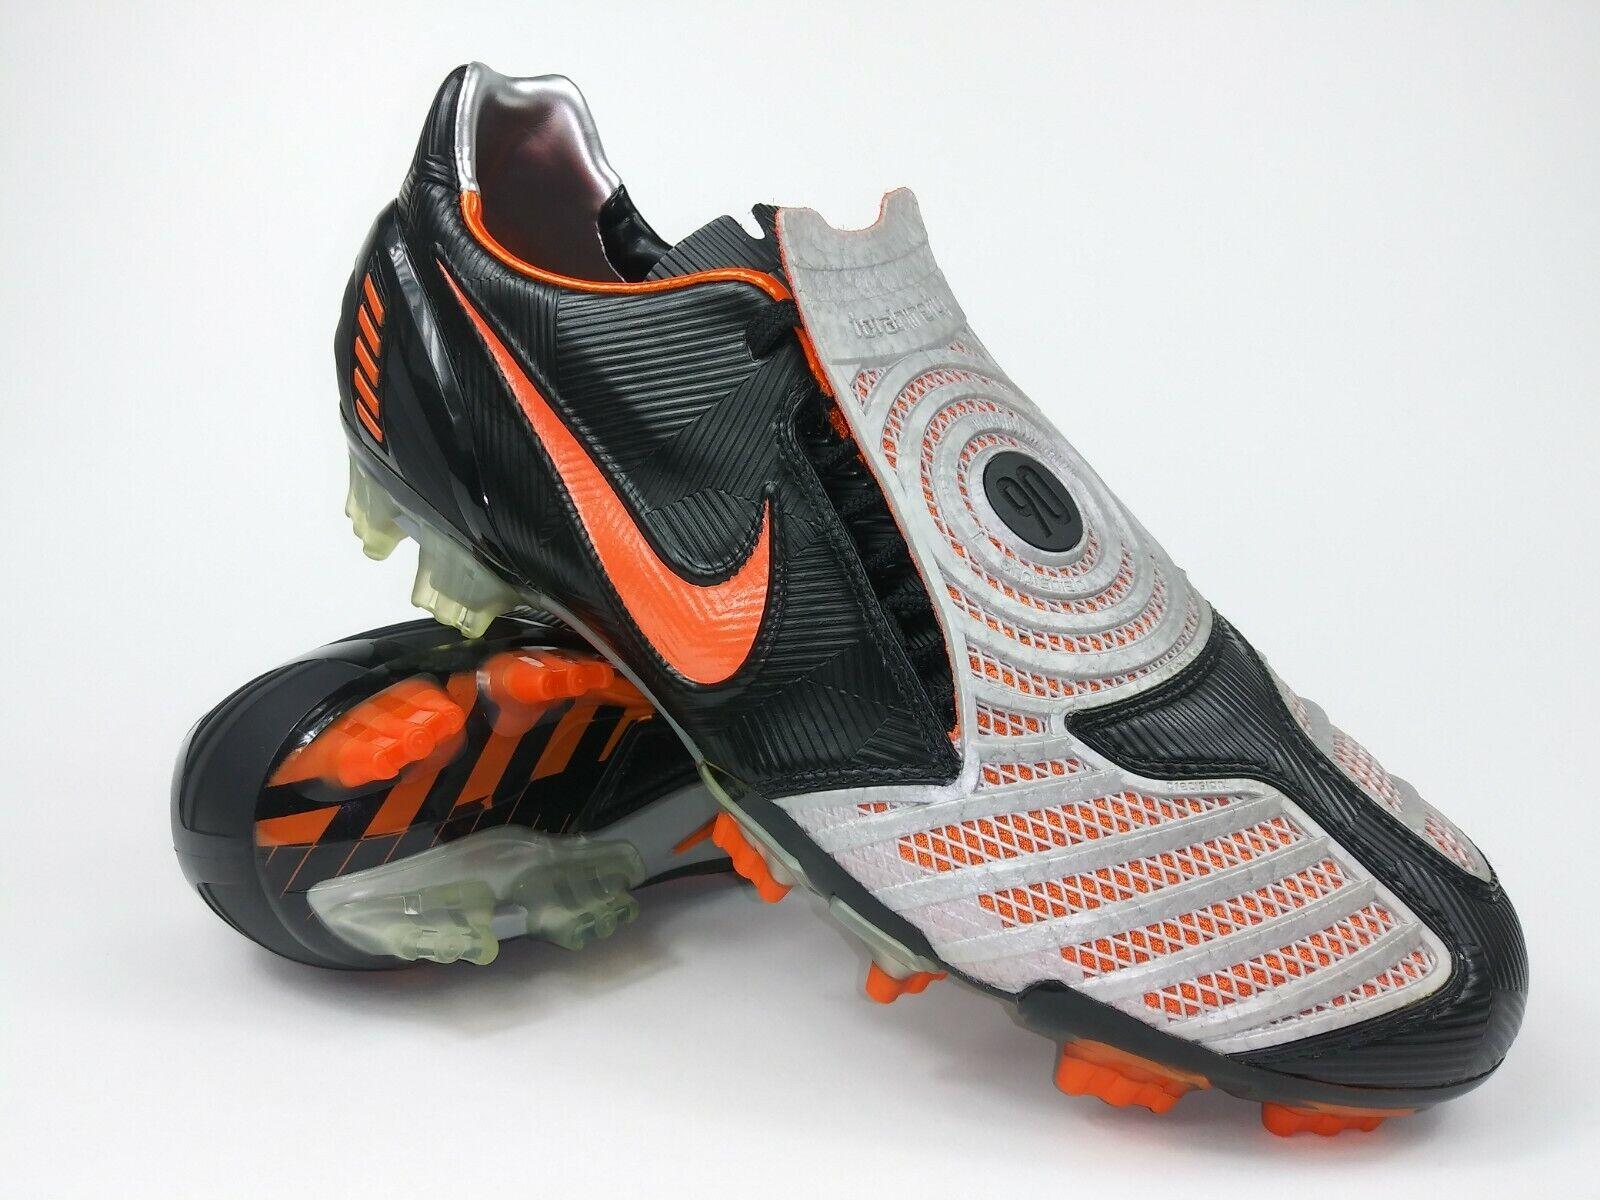 Nike Hombres Raro Total90 Laser Ll Fg 318793 081 Negro Naranja Fútbol Tacos